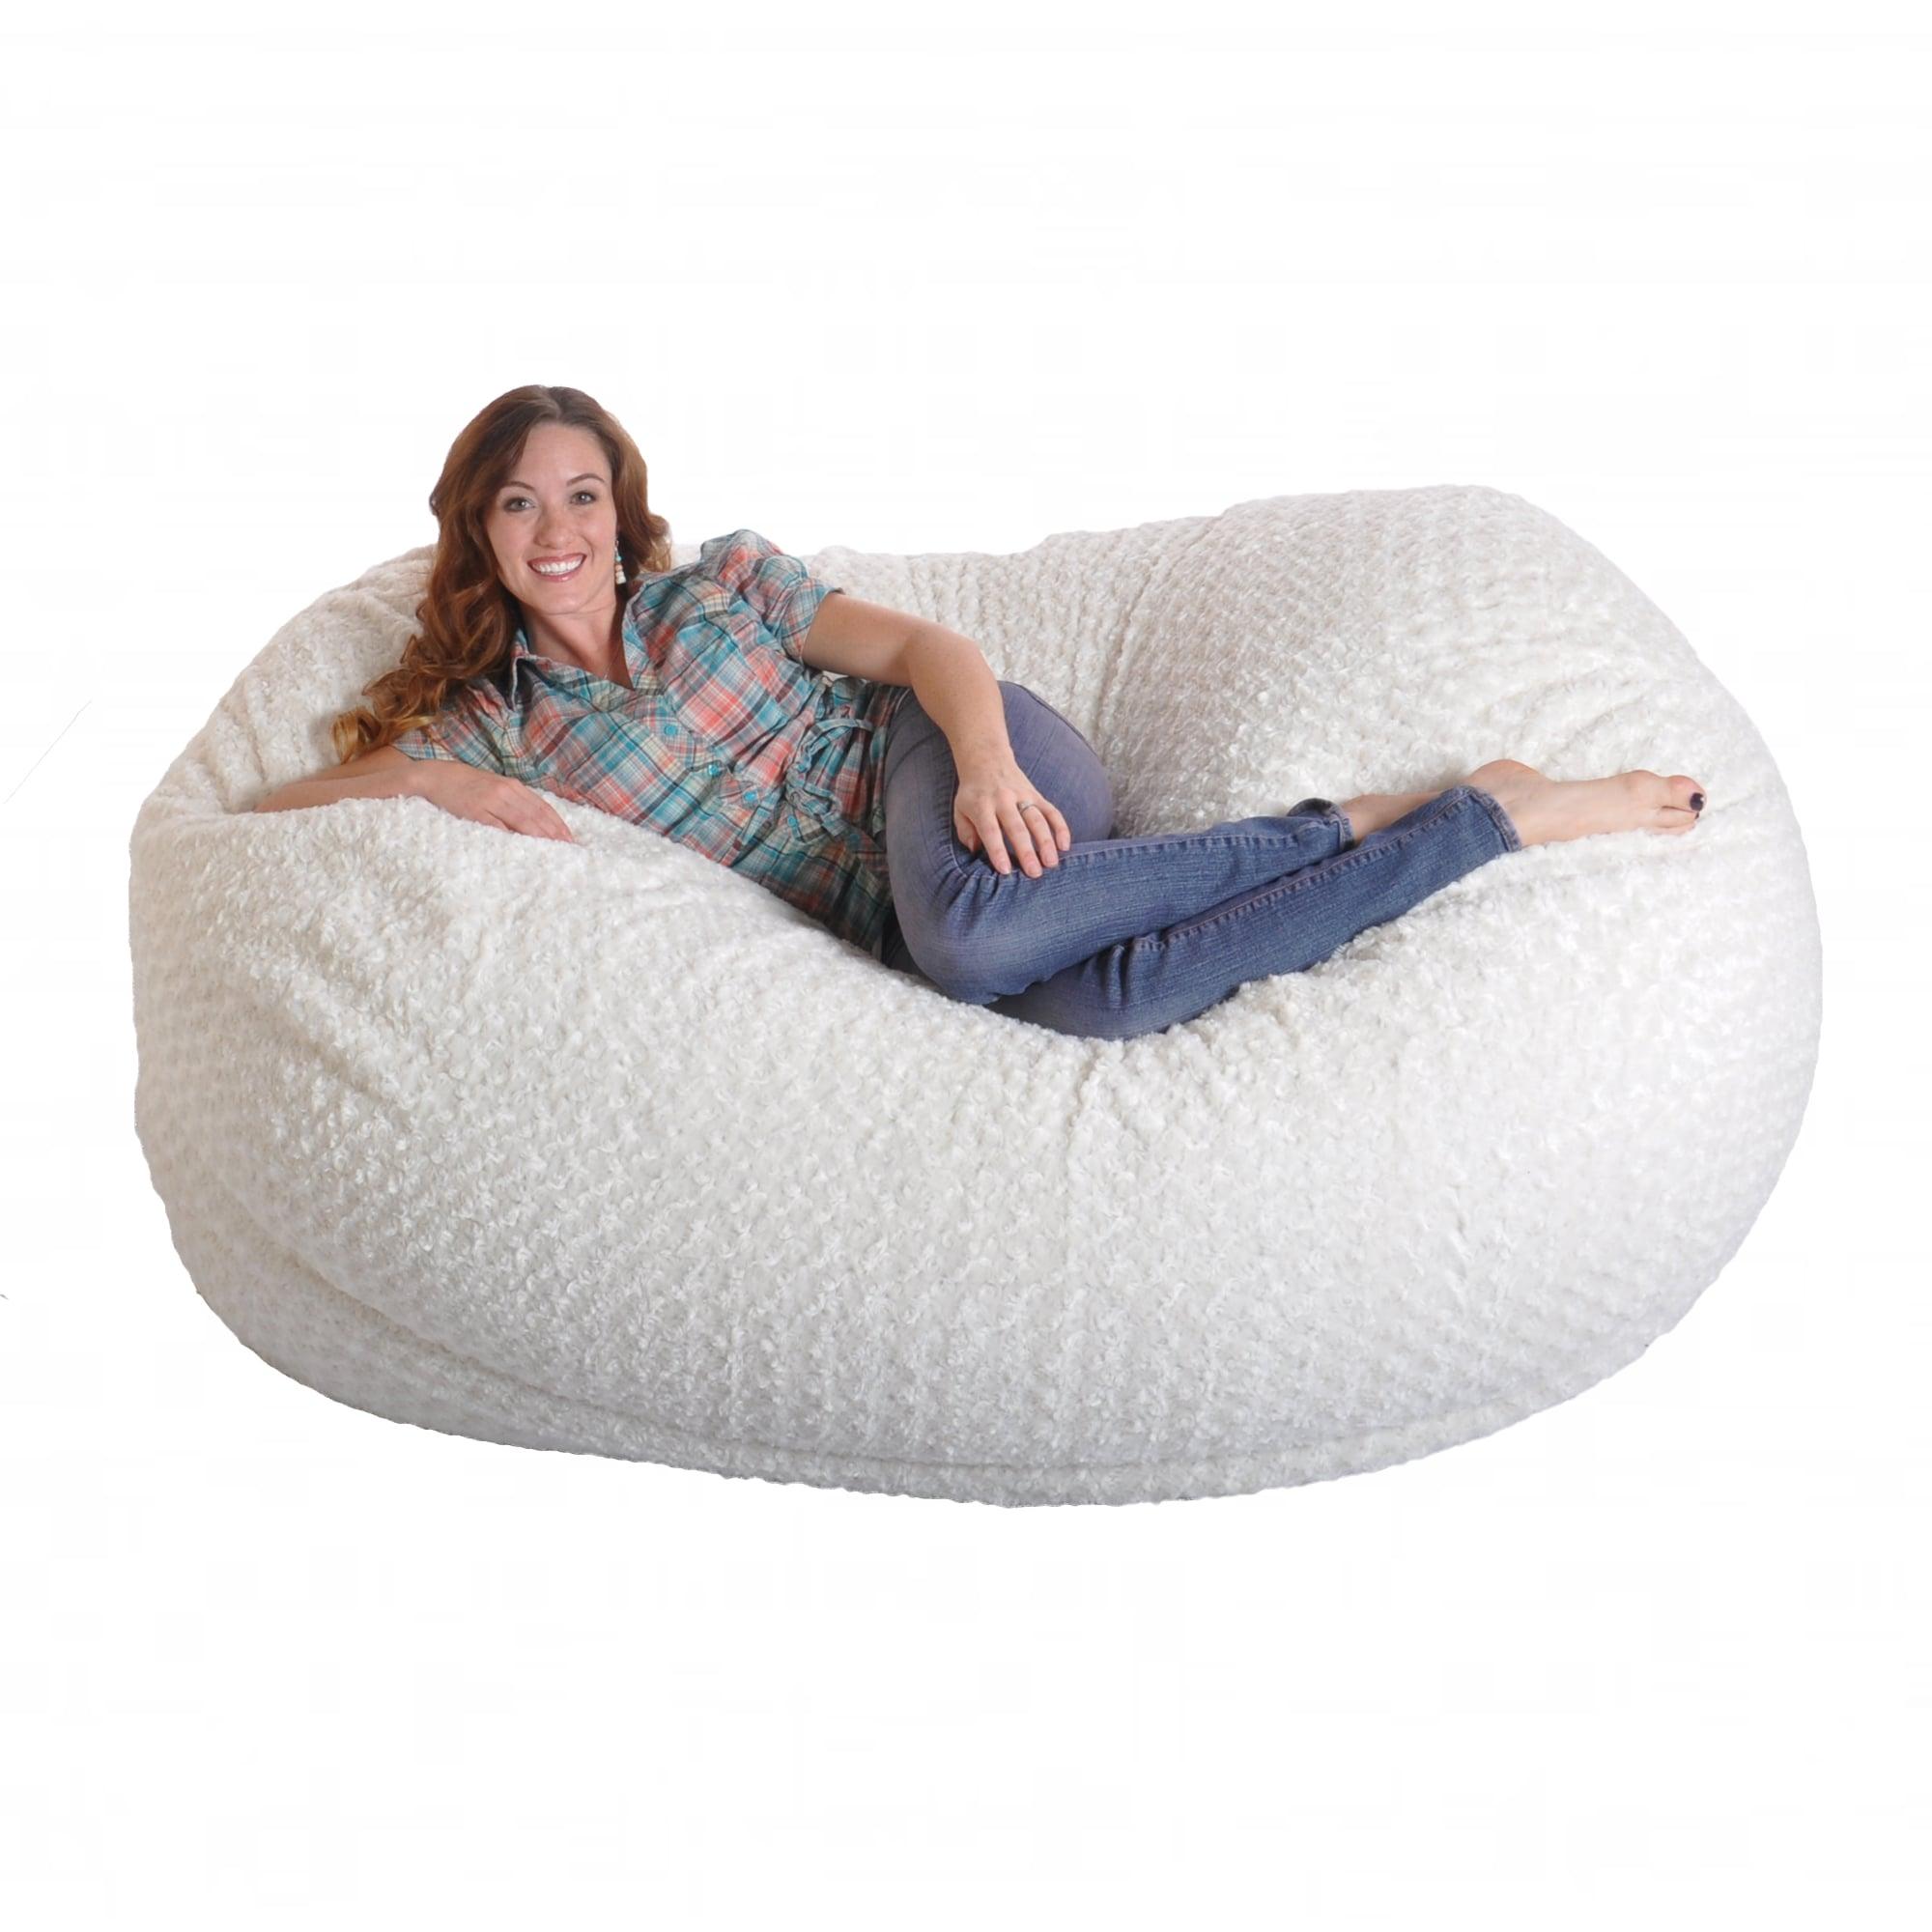 6-foot Soft White Fur Large Oval Microfiber Memory Foam ...